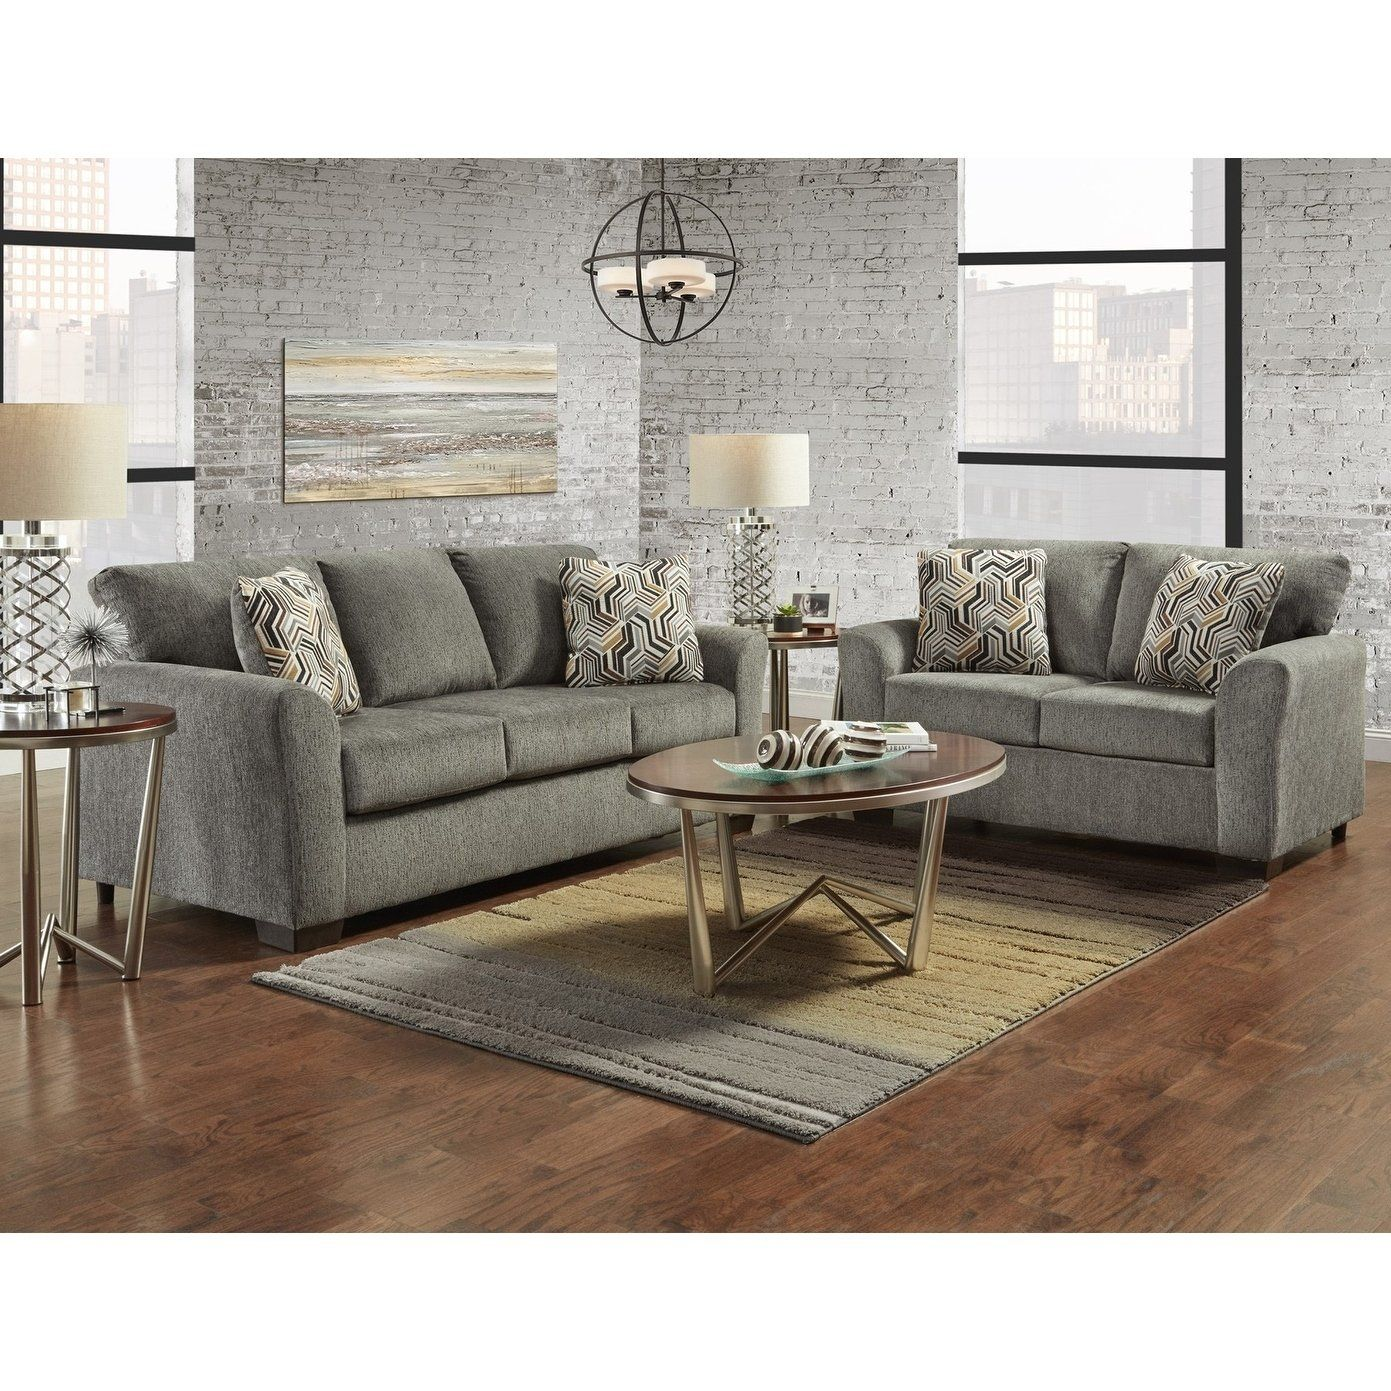 Surprising Sofatrendz Cariana Grey Sofa Loveseat 2 Pc Set Gray Ncnpc Chair Design For Home Ncnpcorg